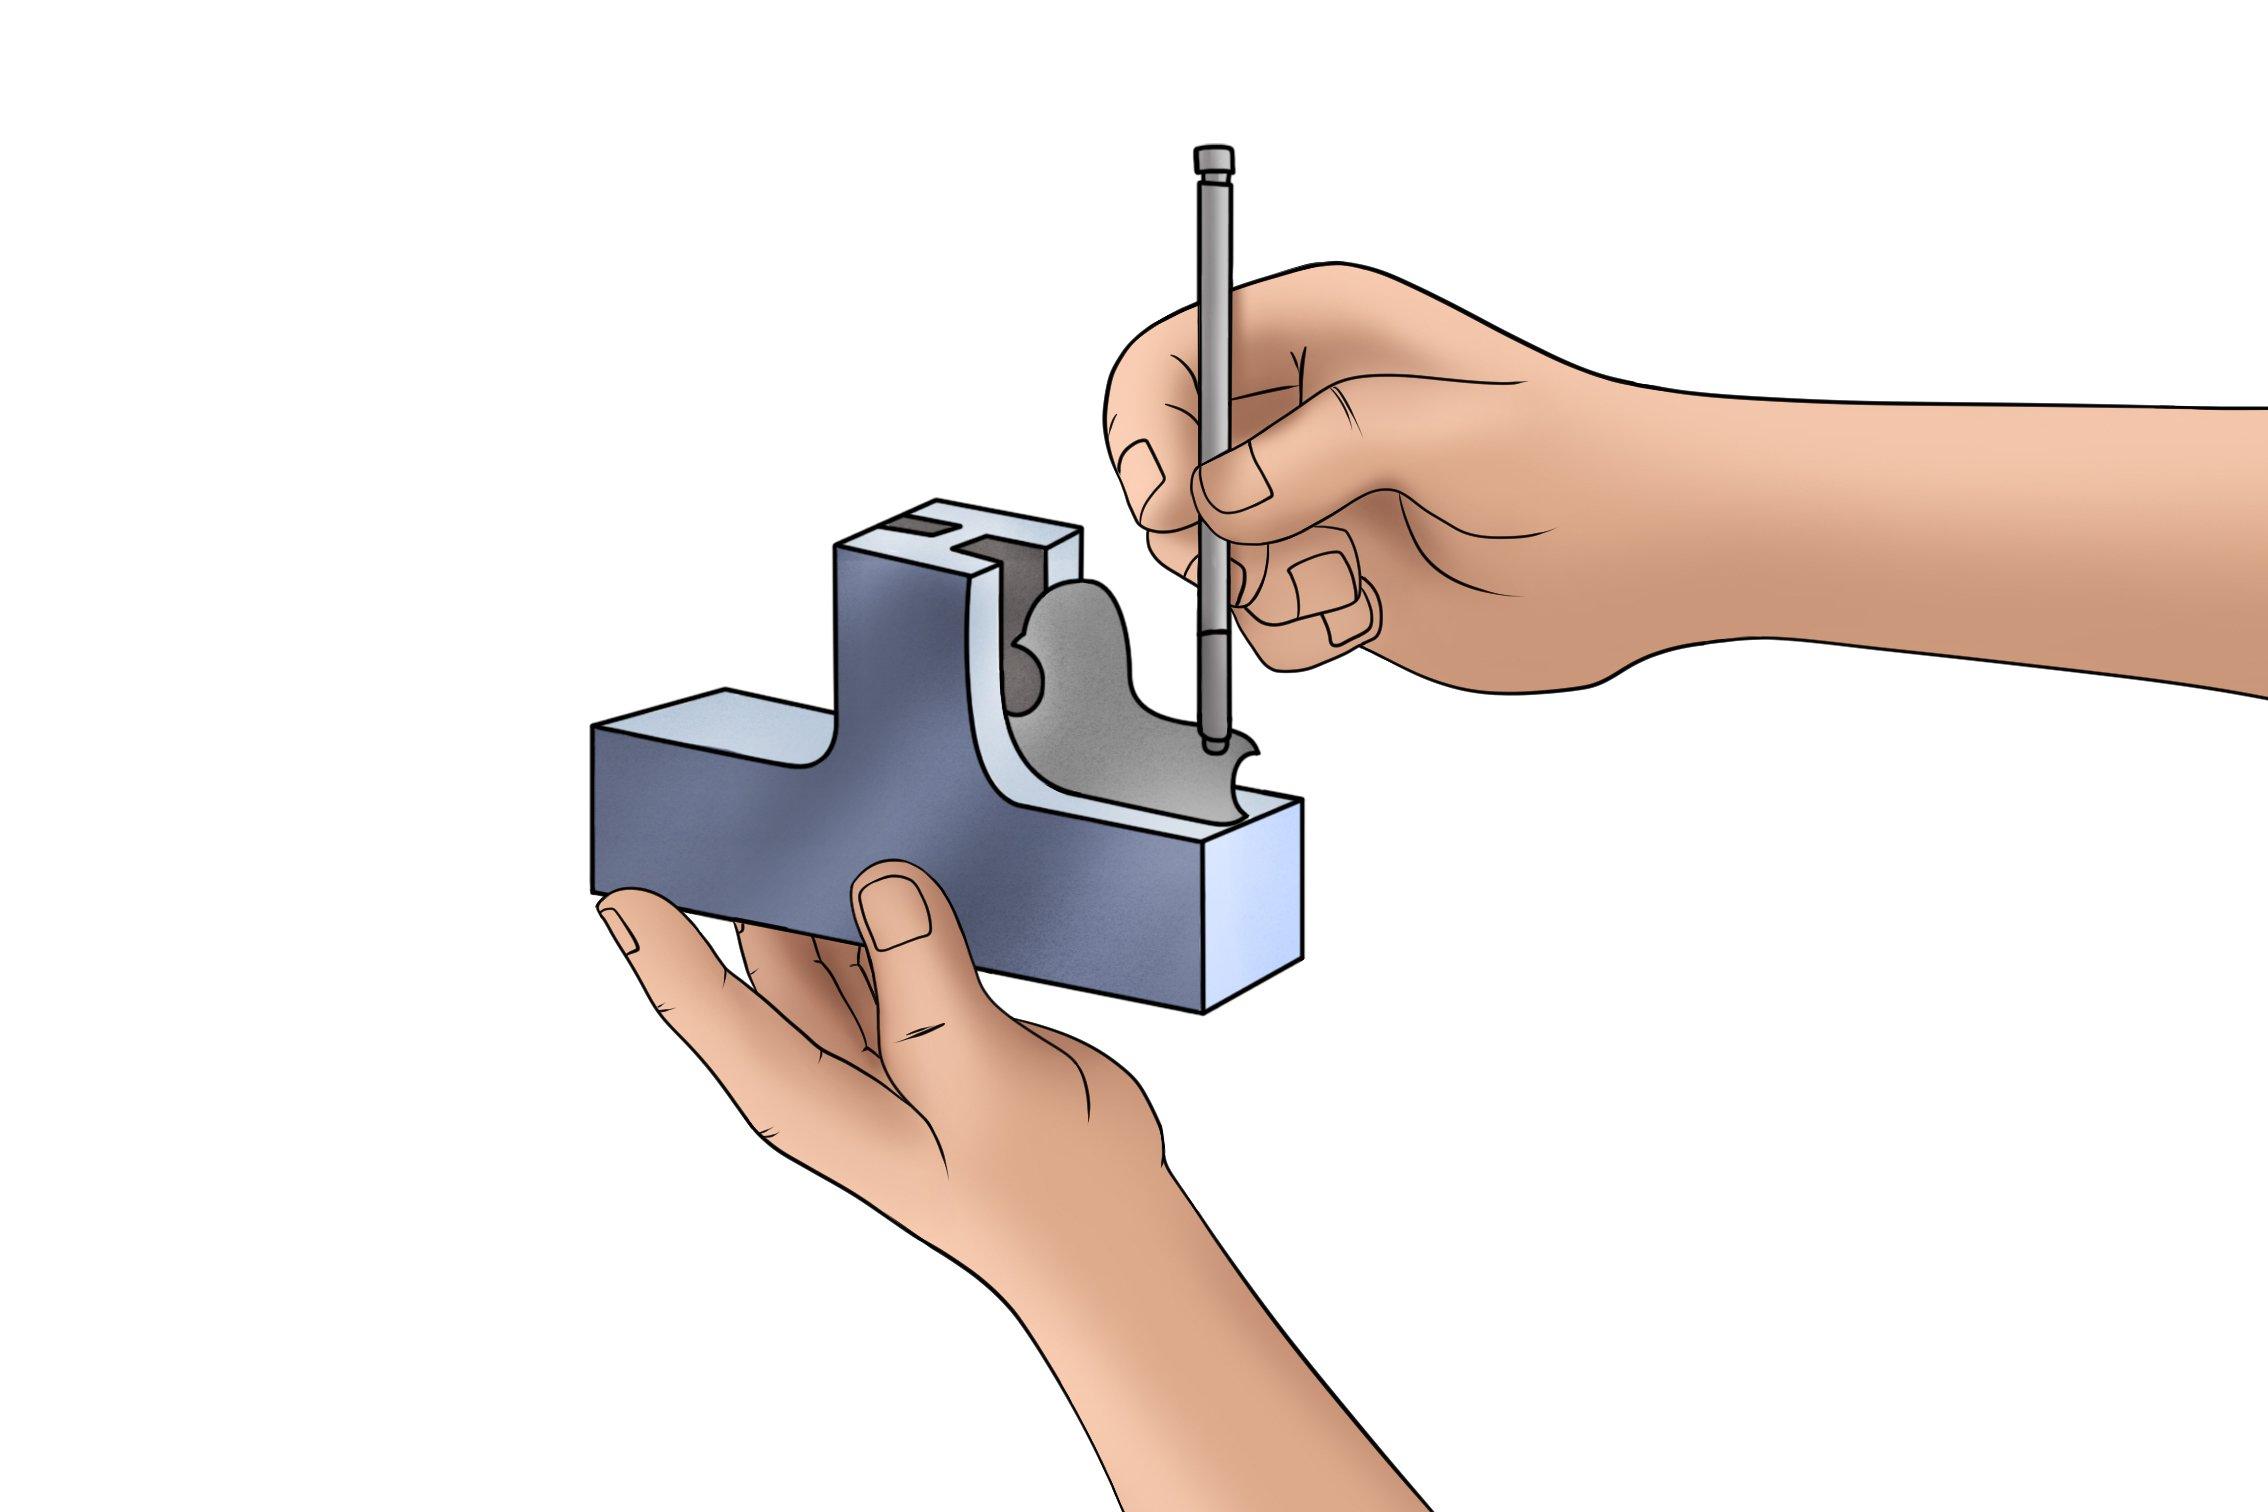 Measuring a metal work piece with a radius gauge